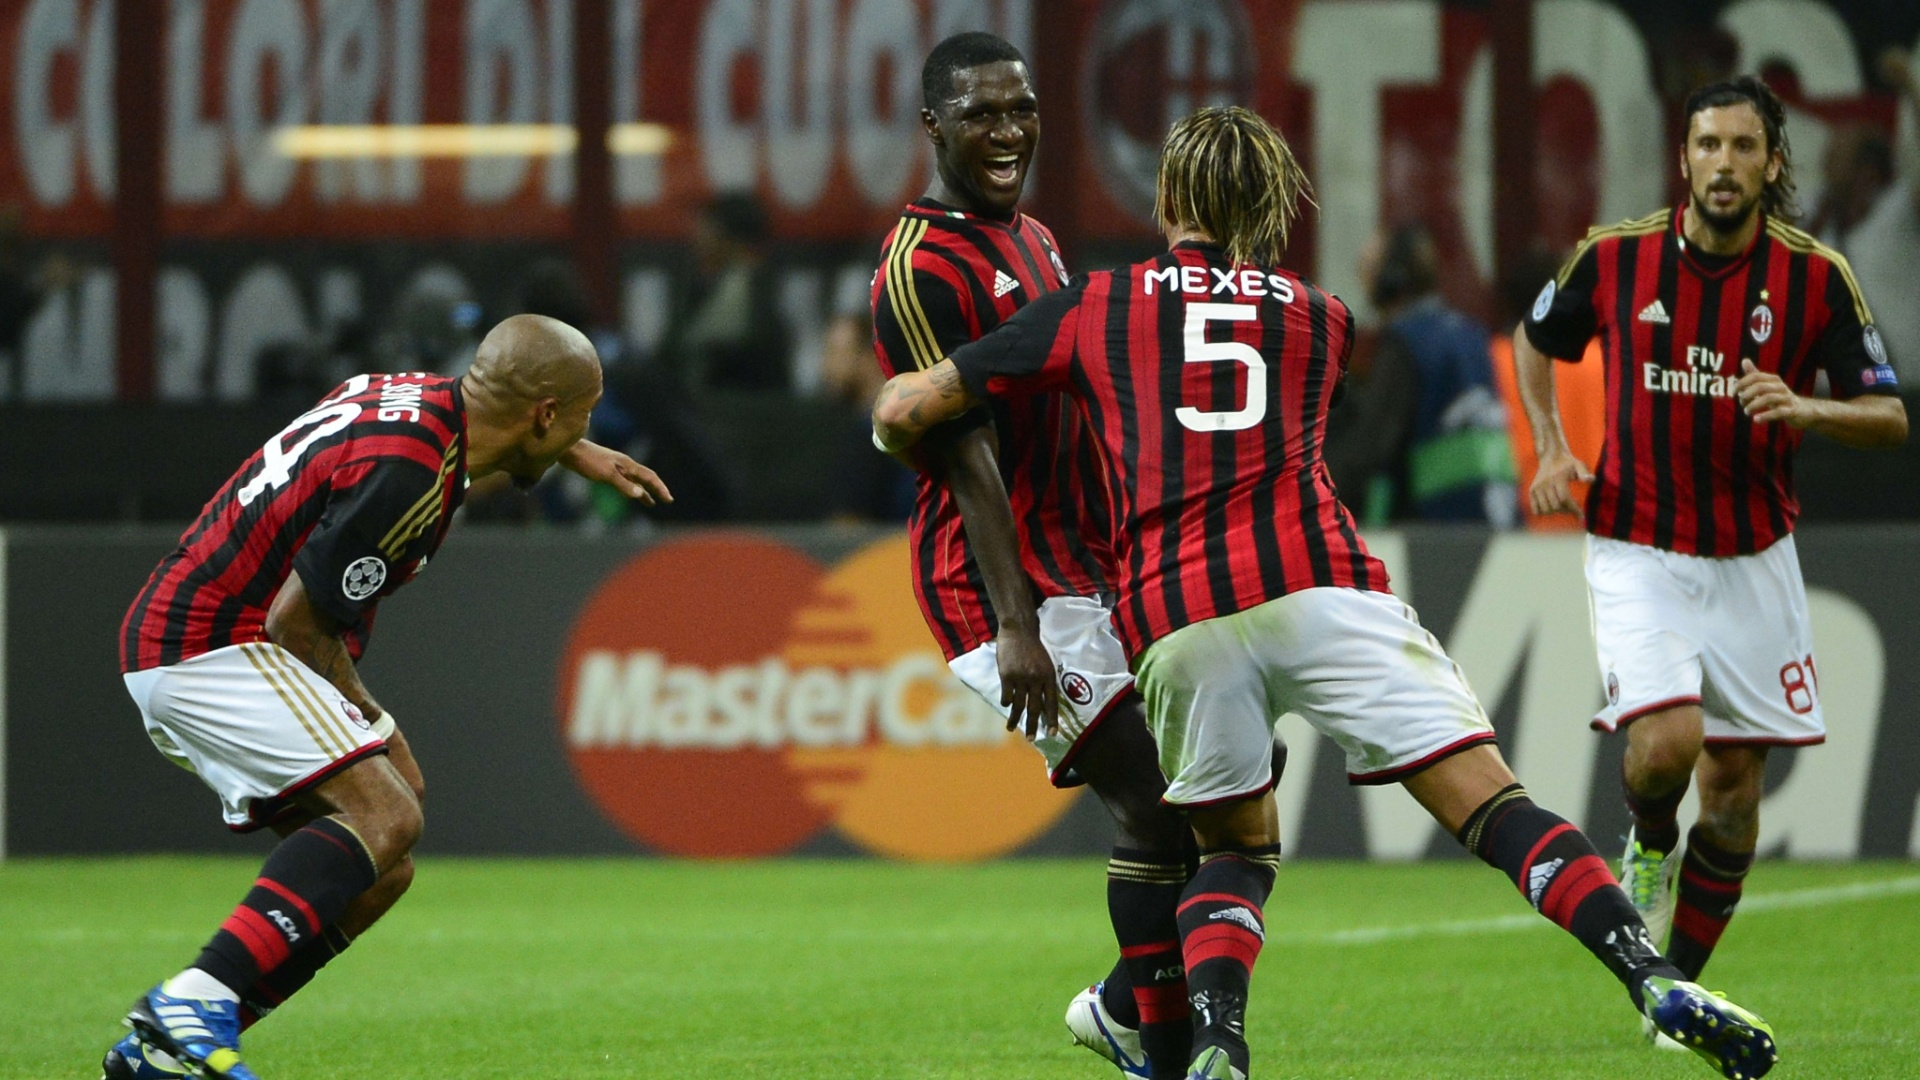 18.set.2013 - Zapata, do Milan, comemora gol na vitória dos italianos sobre o Celtic por 2 a 0